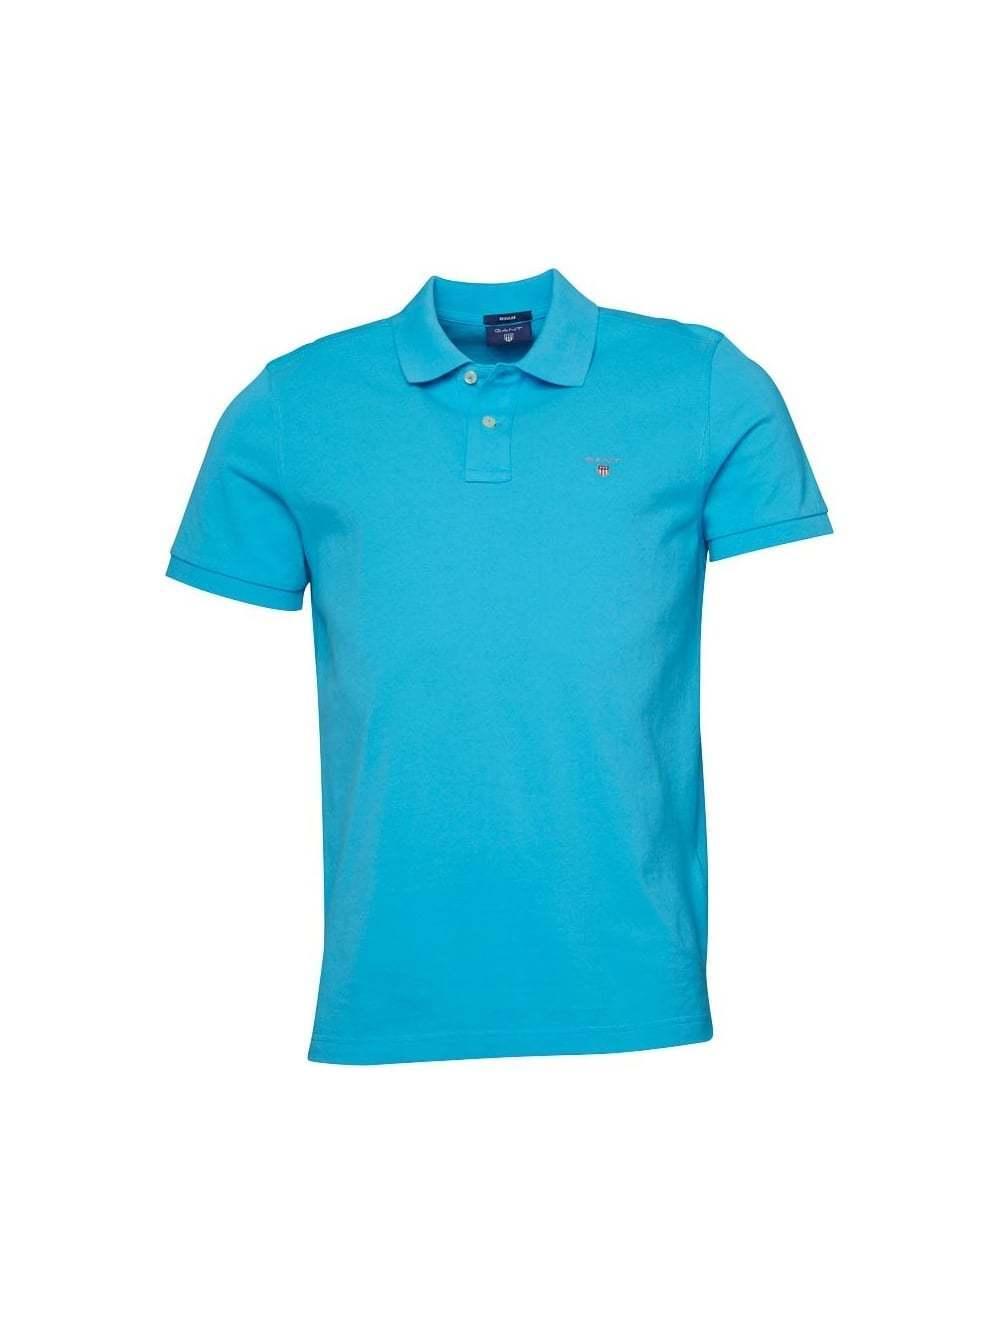 GANT Turquoise bluee Classic Polo Shirt